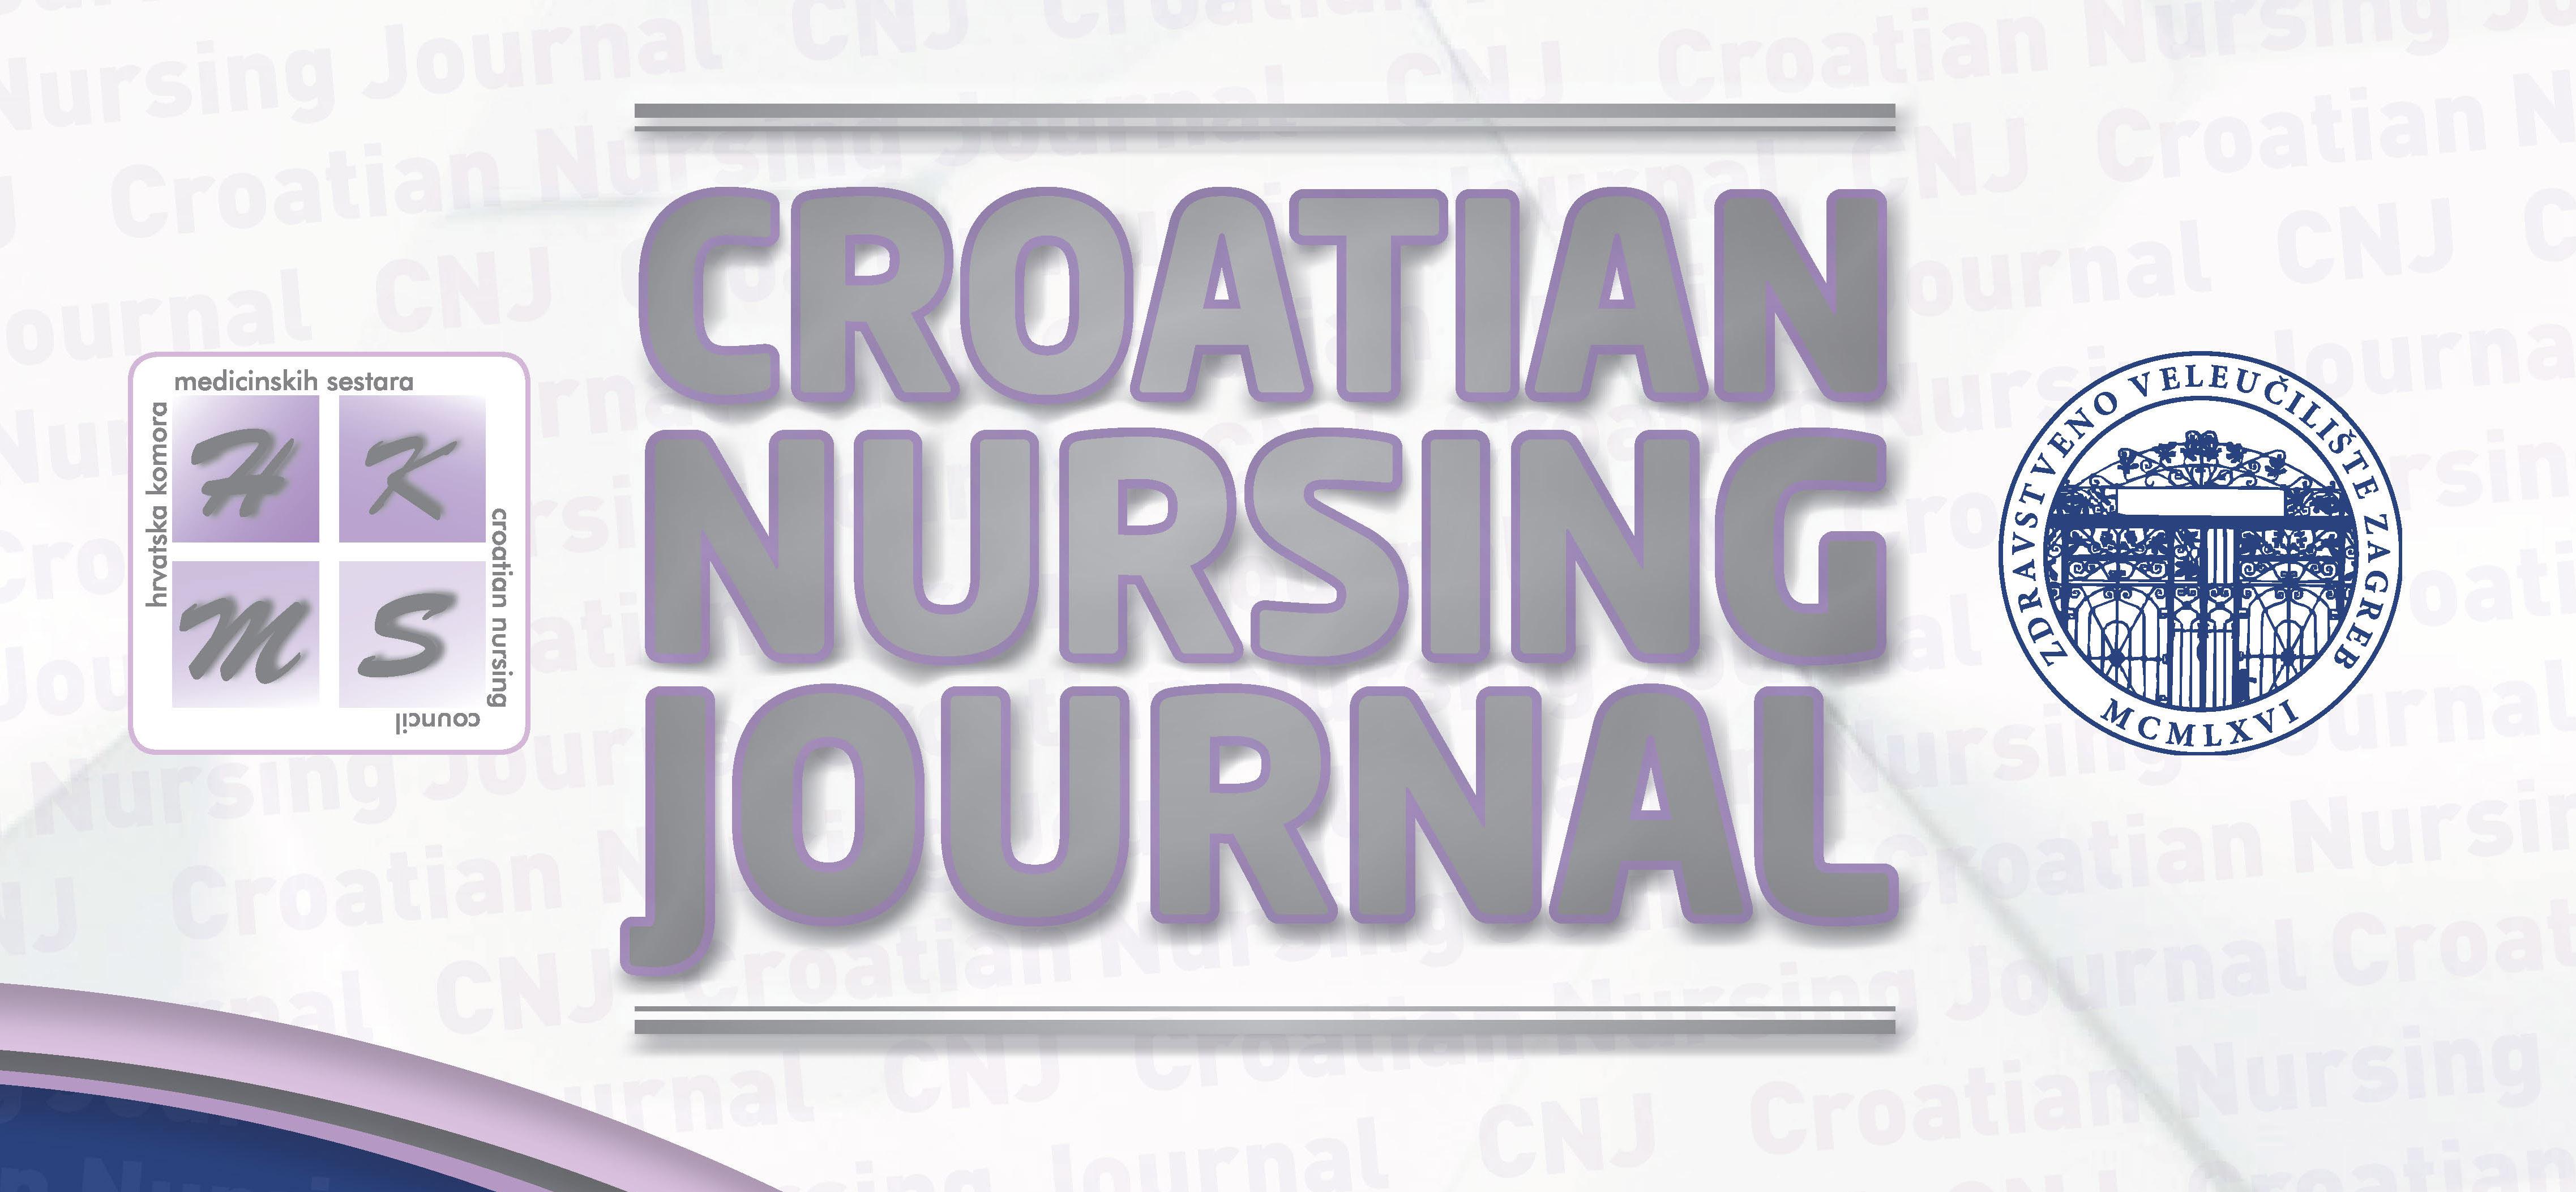 Croatian Nursing Journal